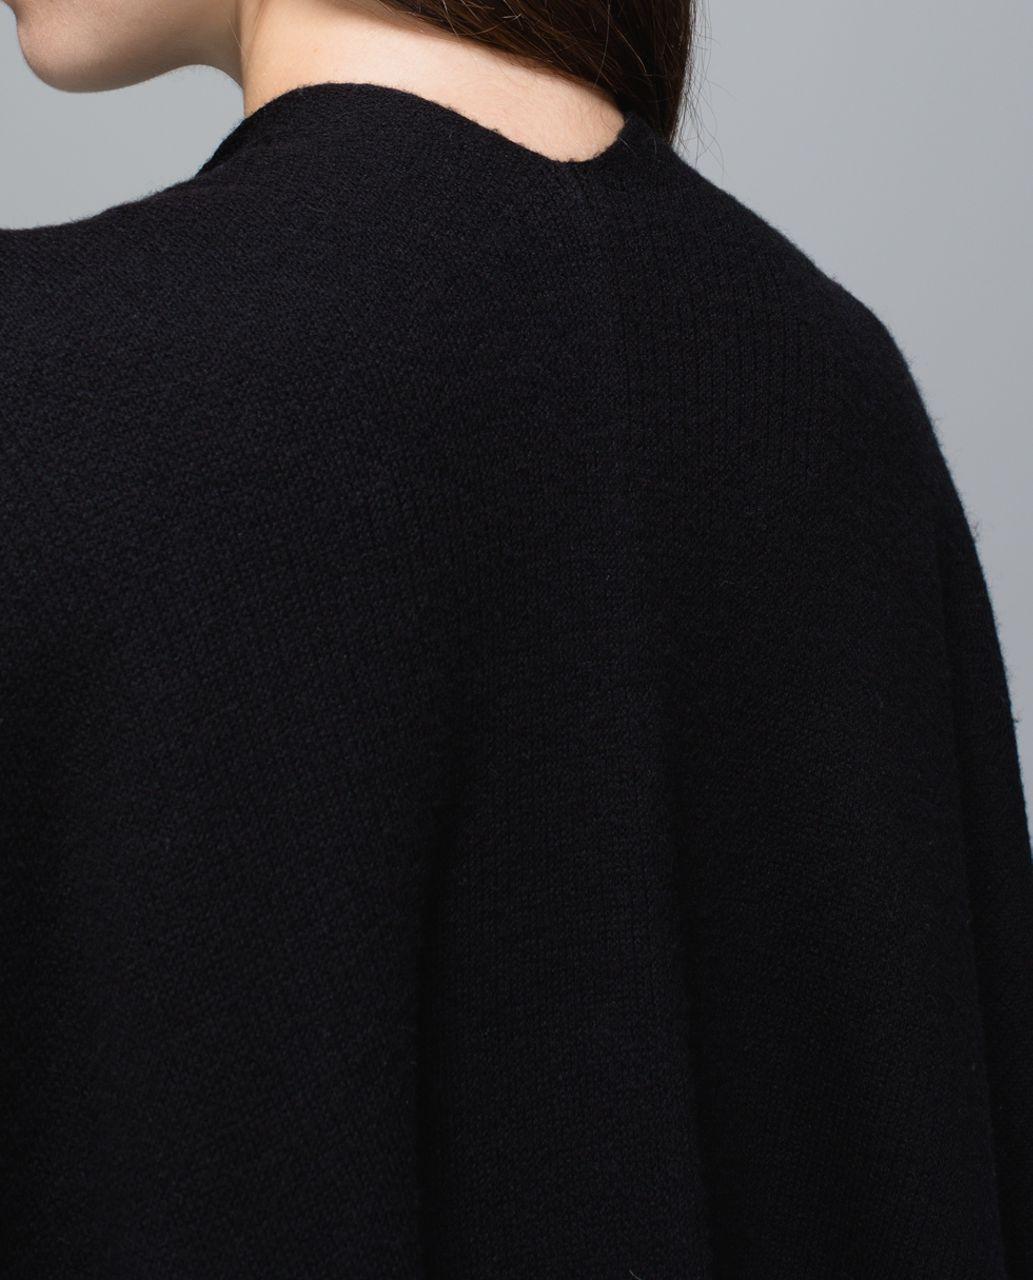 Lululemon Bundle Up Scarf - Black /  Heathered Black